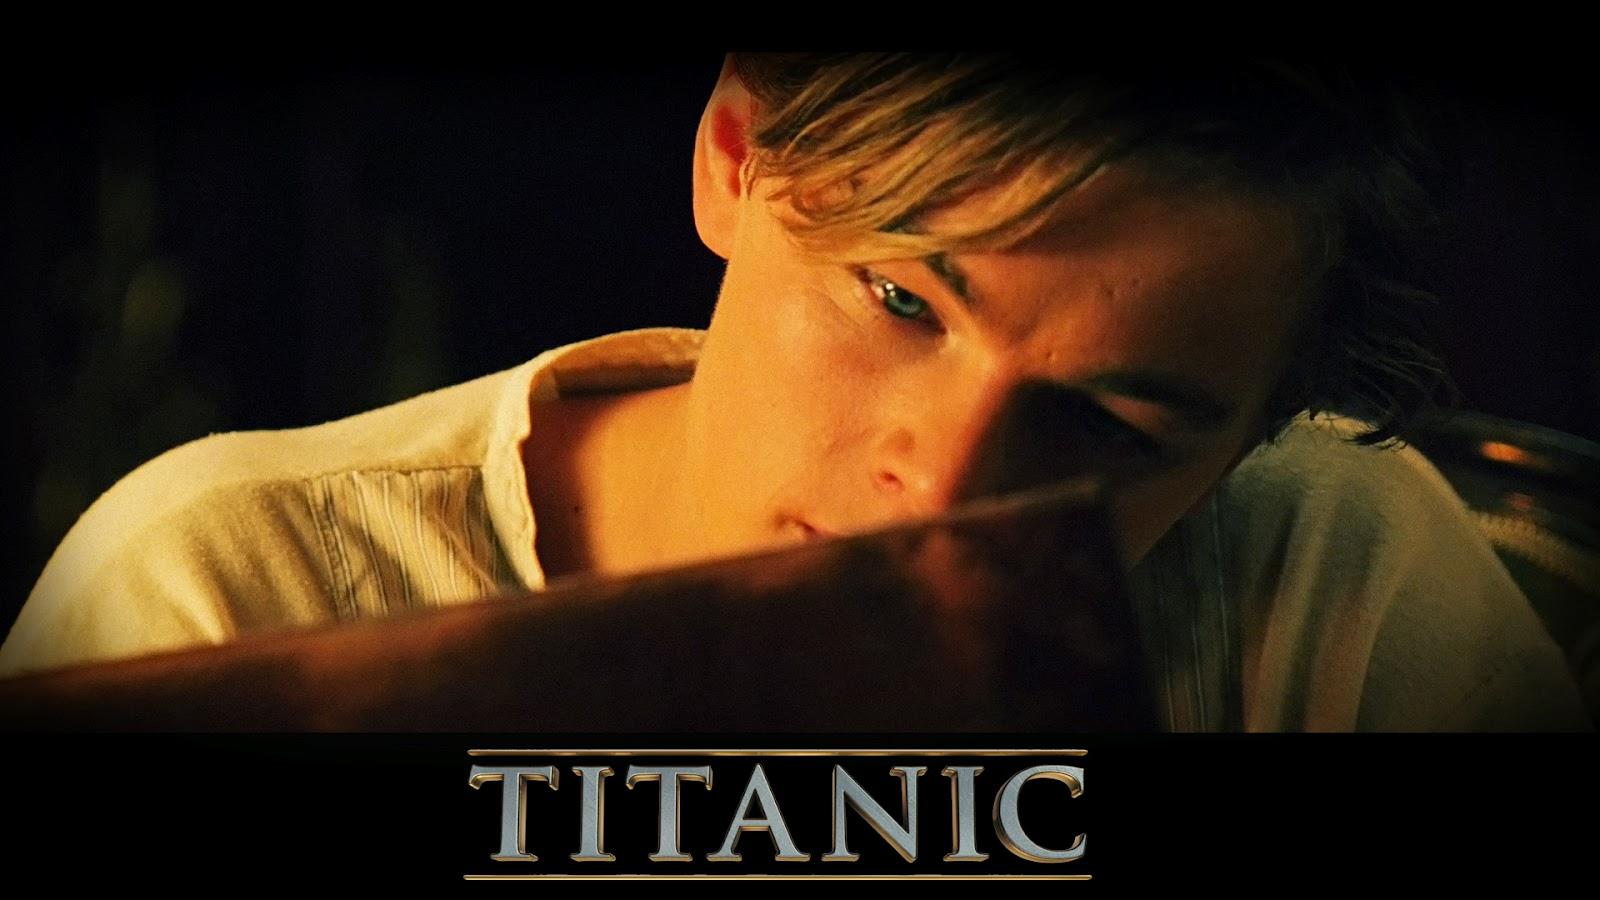 Titanic Ship 3d Wallpaper Free Download Free Wallpapers Titanic Latest Hd Wallpapers